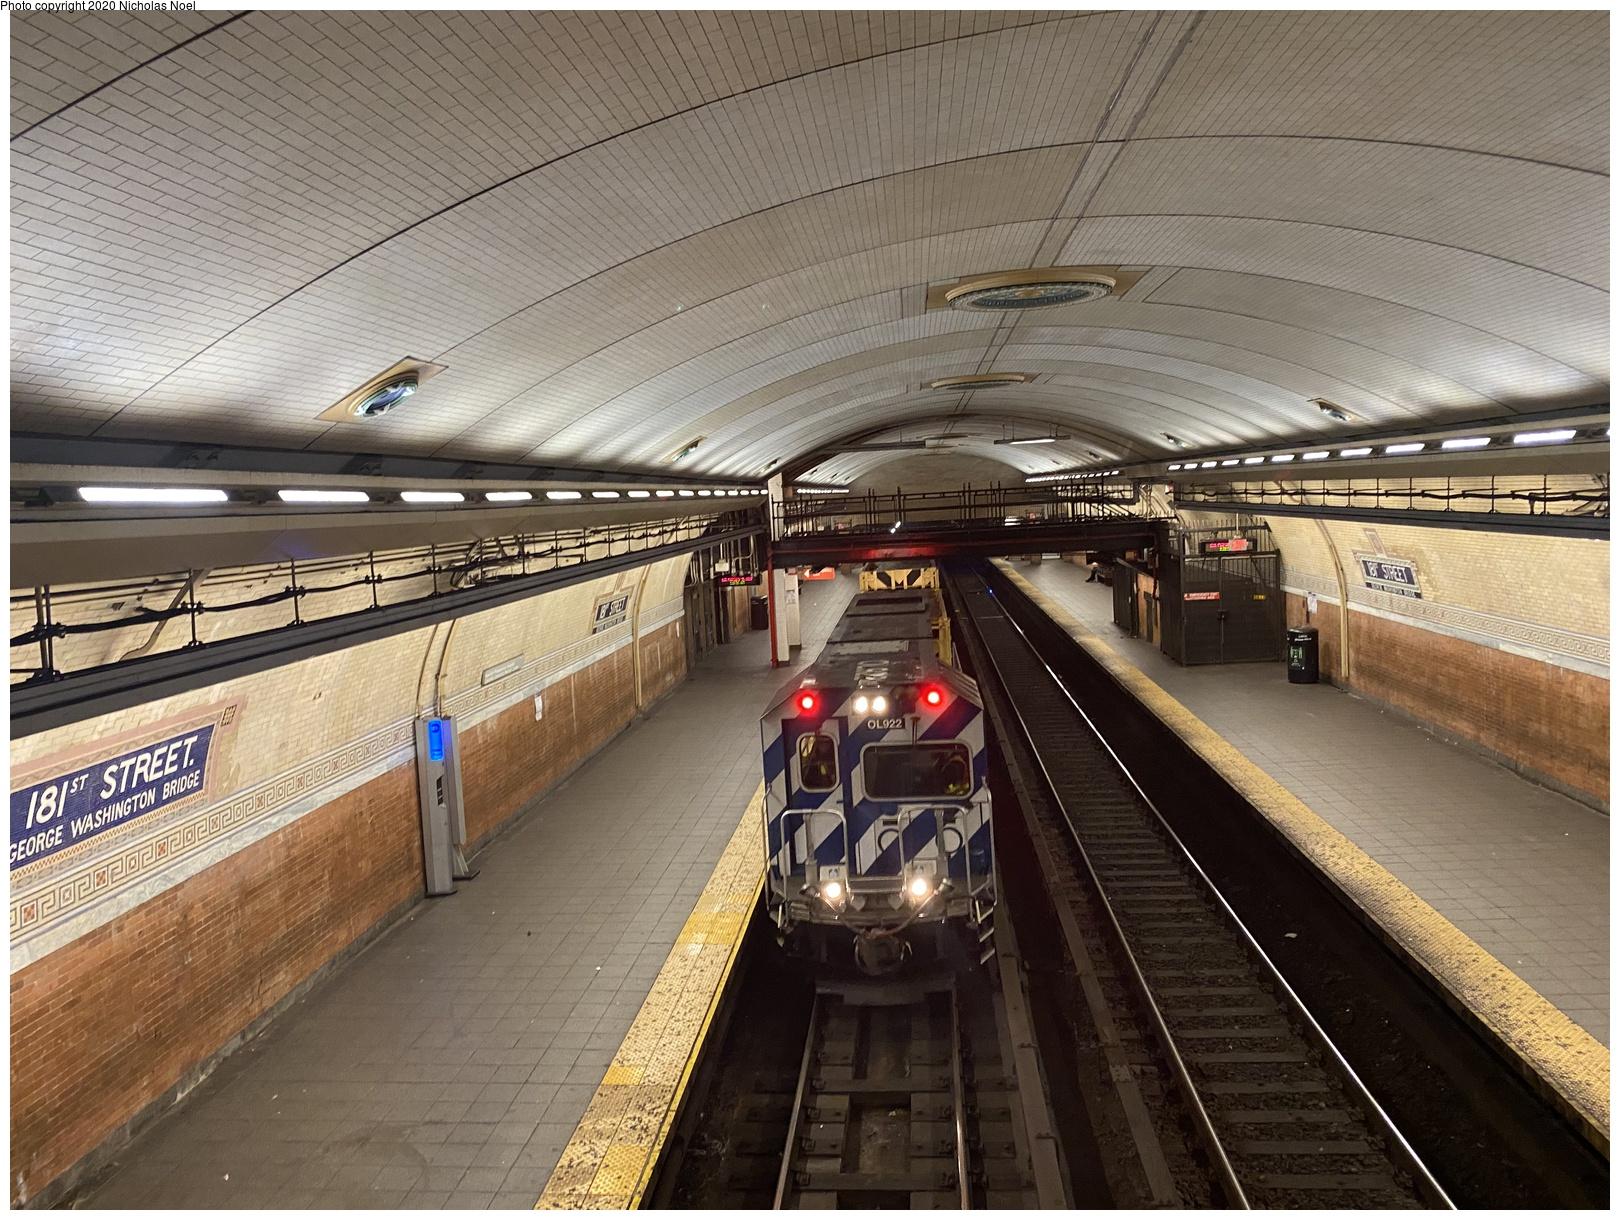 (806k, 1620x1220)<br><b>Country:</b> United States<br><b>City:</b> New York<br><b>System:</b> New York City Transit<br><b>Line:</b> IRT West Side Line<br><b>Location:</b> 181st Street <br><b>Route:</b> Work Service<br><b>Car:</b> R-156 Diesel-Electric Locomotive (MPI, 2012-2013) 922 <br><b>Photo by:</b> Nicholas Noel<br><b>Date:</b> 2/15/2020<br><b>Viewed (this week/total):</b> 21 / 82